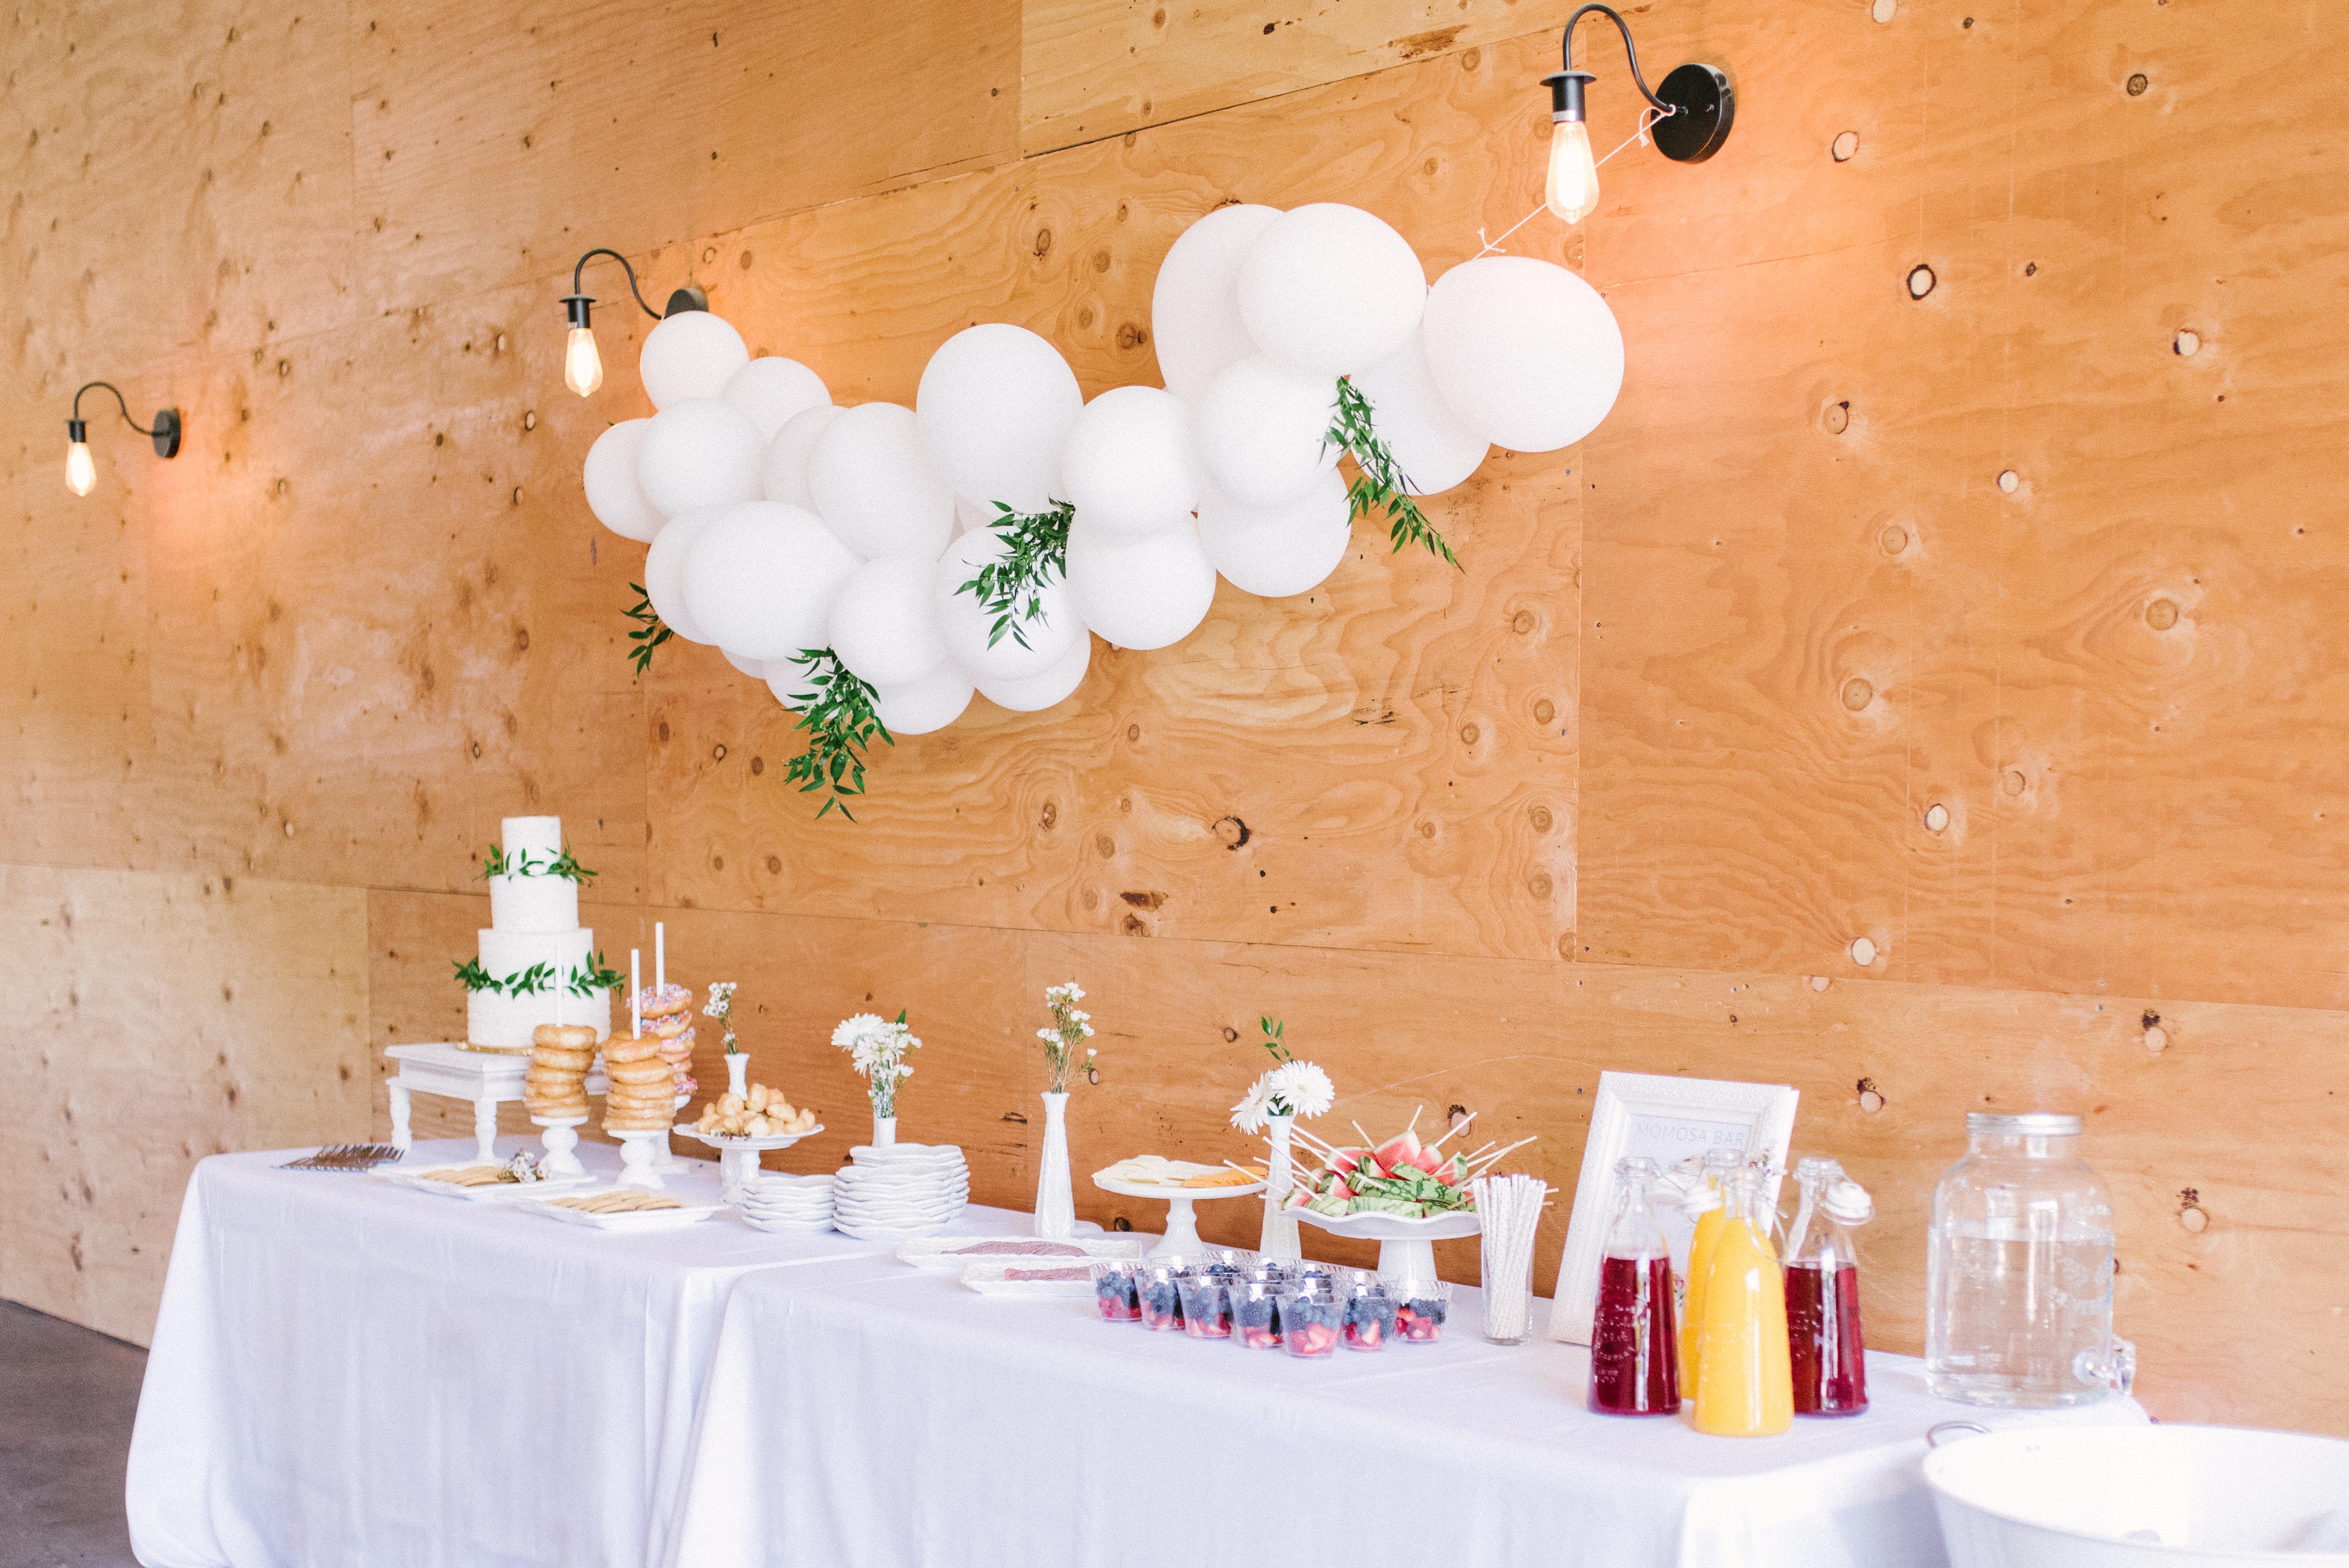 Lovely modern minimalist blush baby shower, set in the coolest industrial farmhouse barn. | glitterinc.com | Hovering Heart Photography | @glitterinc - Modern Minimalist Blush Baby Shower by popular North Carolina style blogger Glitter, Inc.